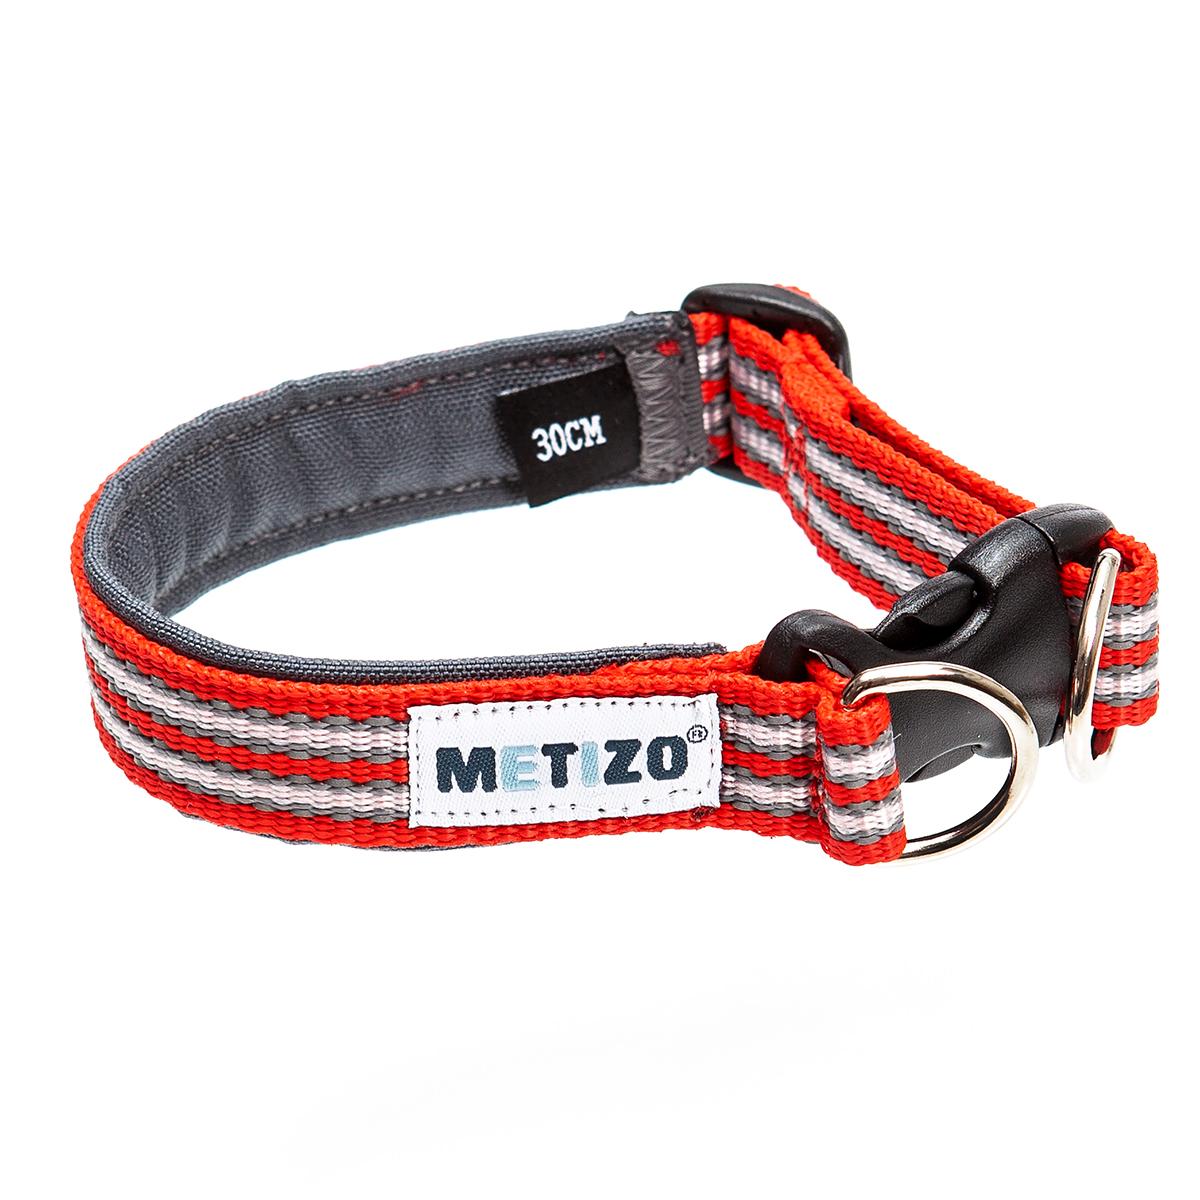 Halsband Fast - Röd 25 cm, Röd 30 cm, Röd 35 cm, Röd 40 cm